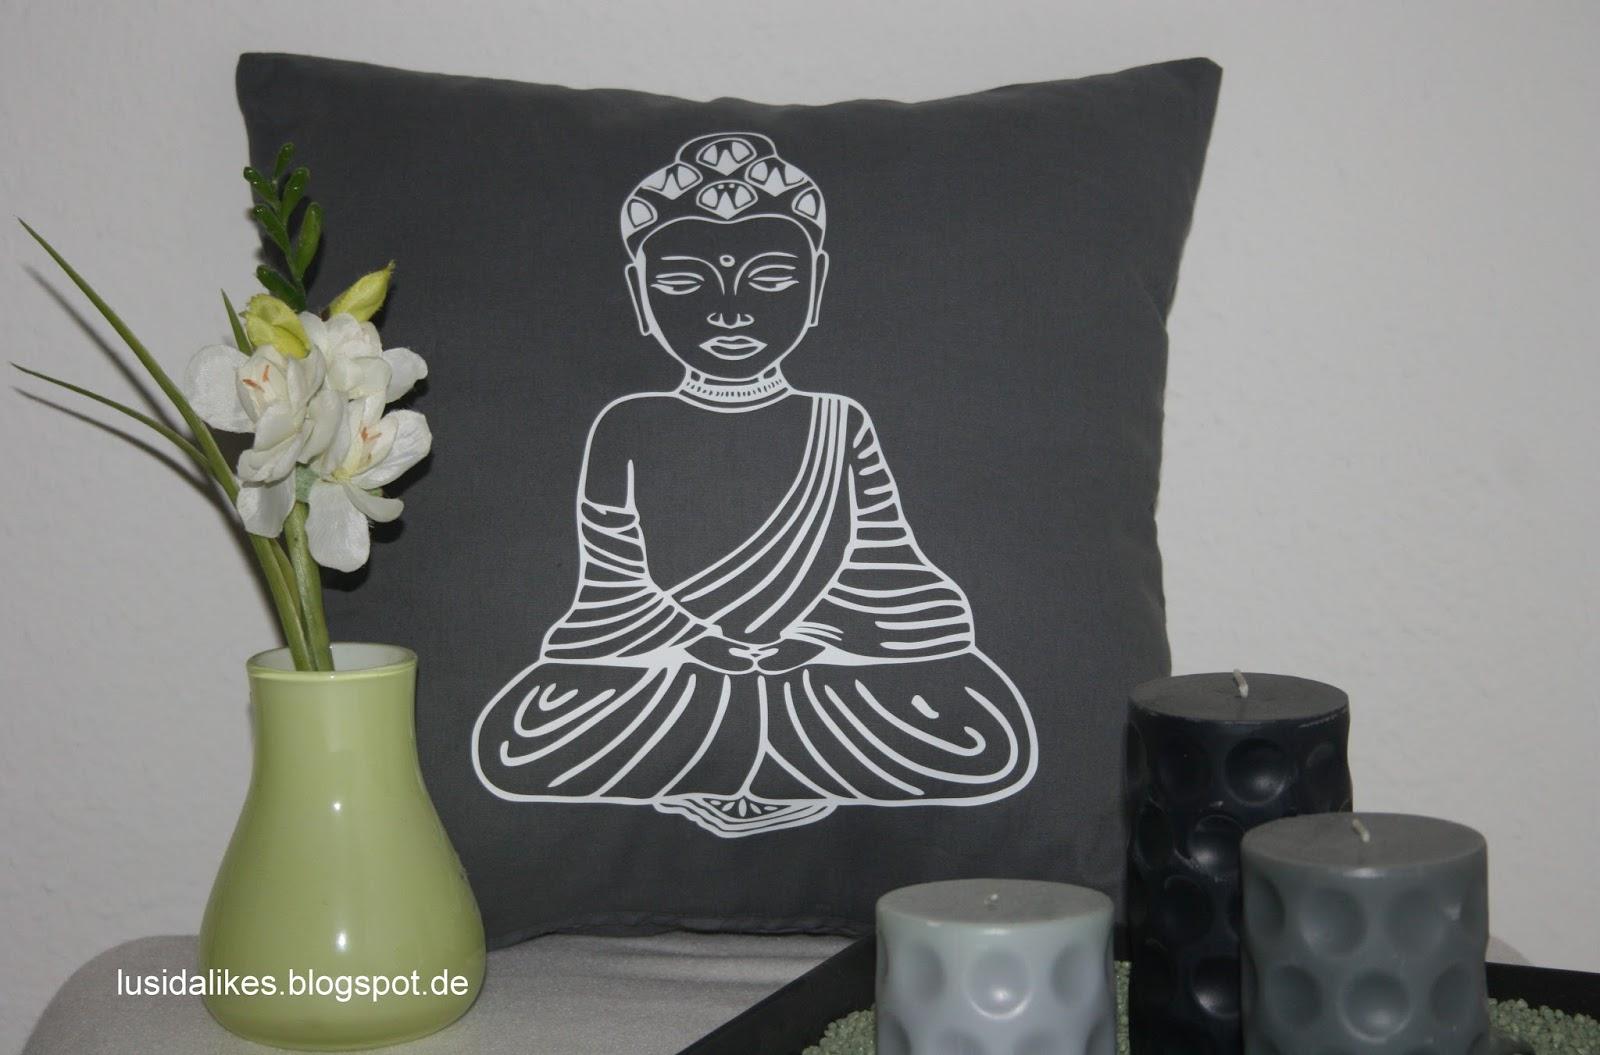 lusida likes selbstgen htes kissen mit buddha plottermotiv. Black Bedroom Furniture Sets. Home Design Ideas